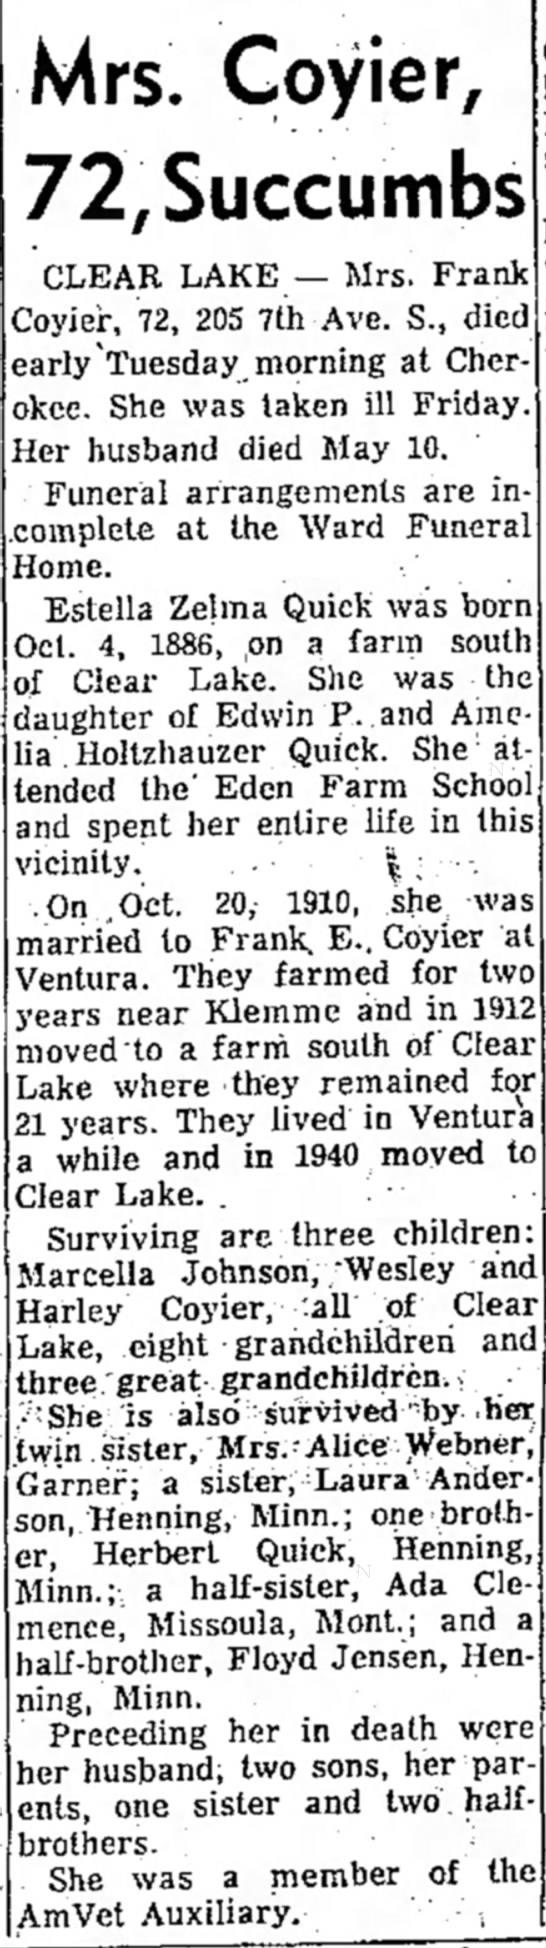 Estella Velma Quikc Coyier Obituary